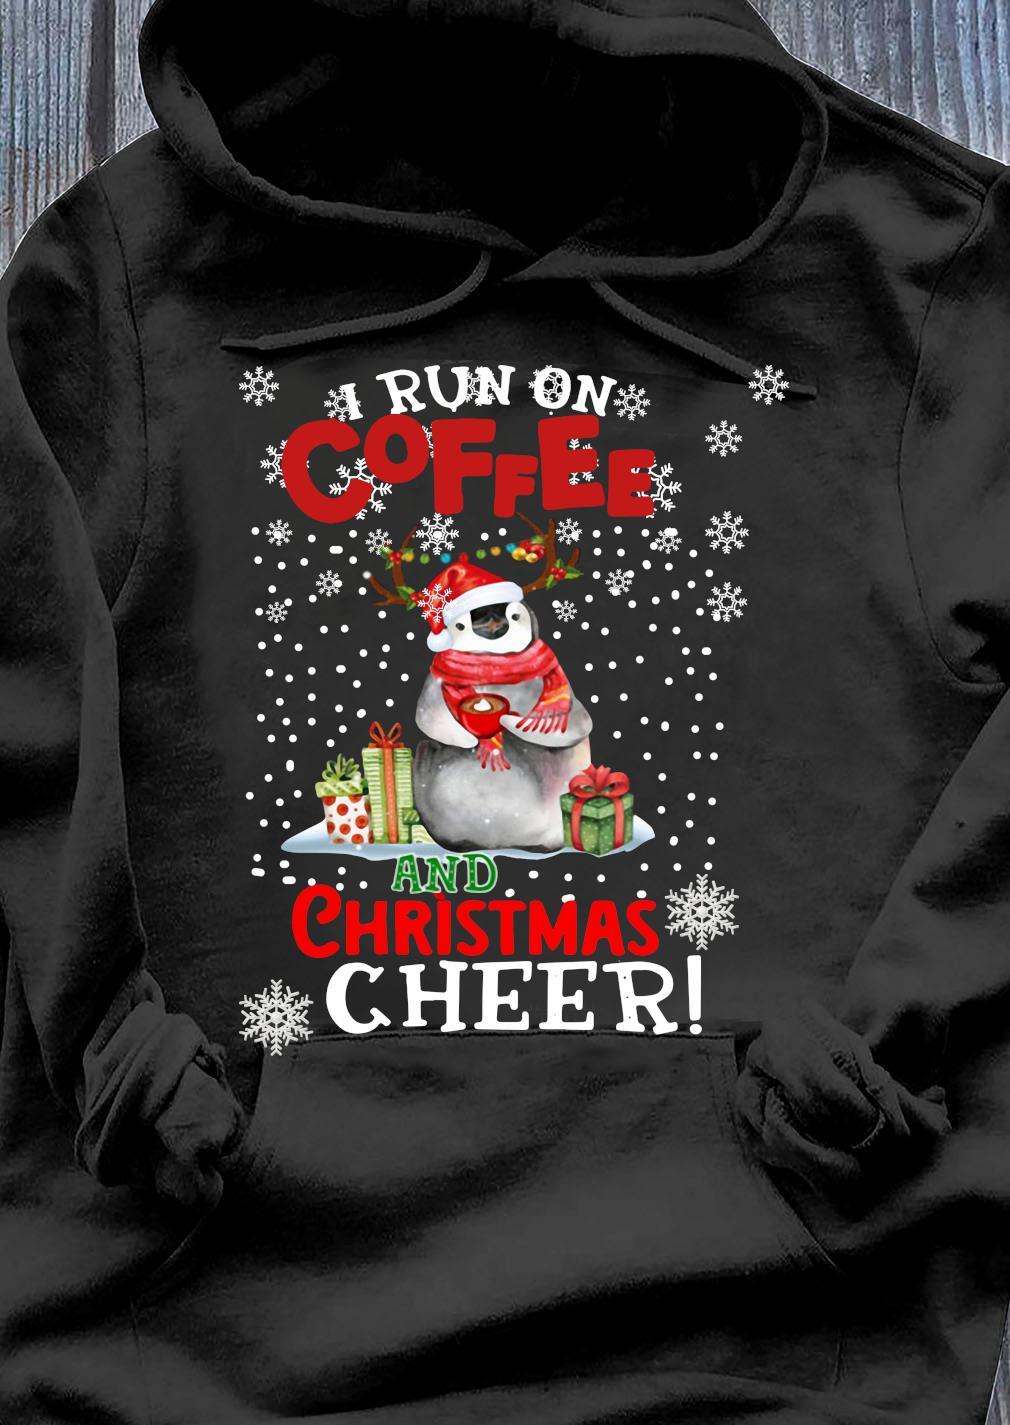 Penguins I Run On Coffee Christmas Cheer Sweats Hoodie